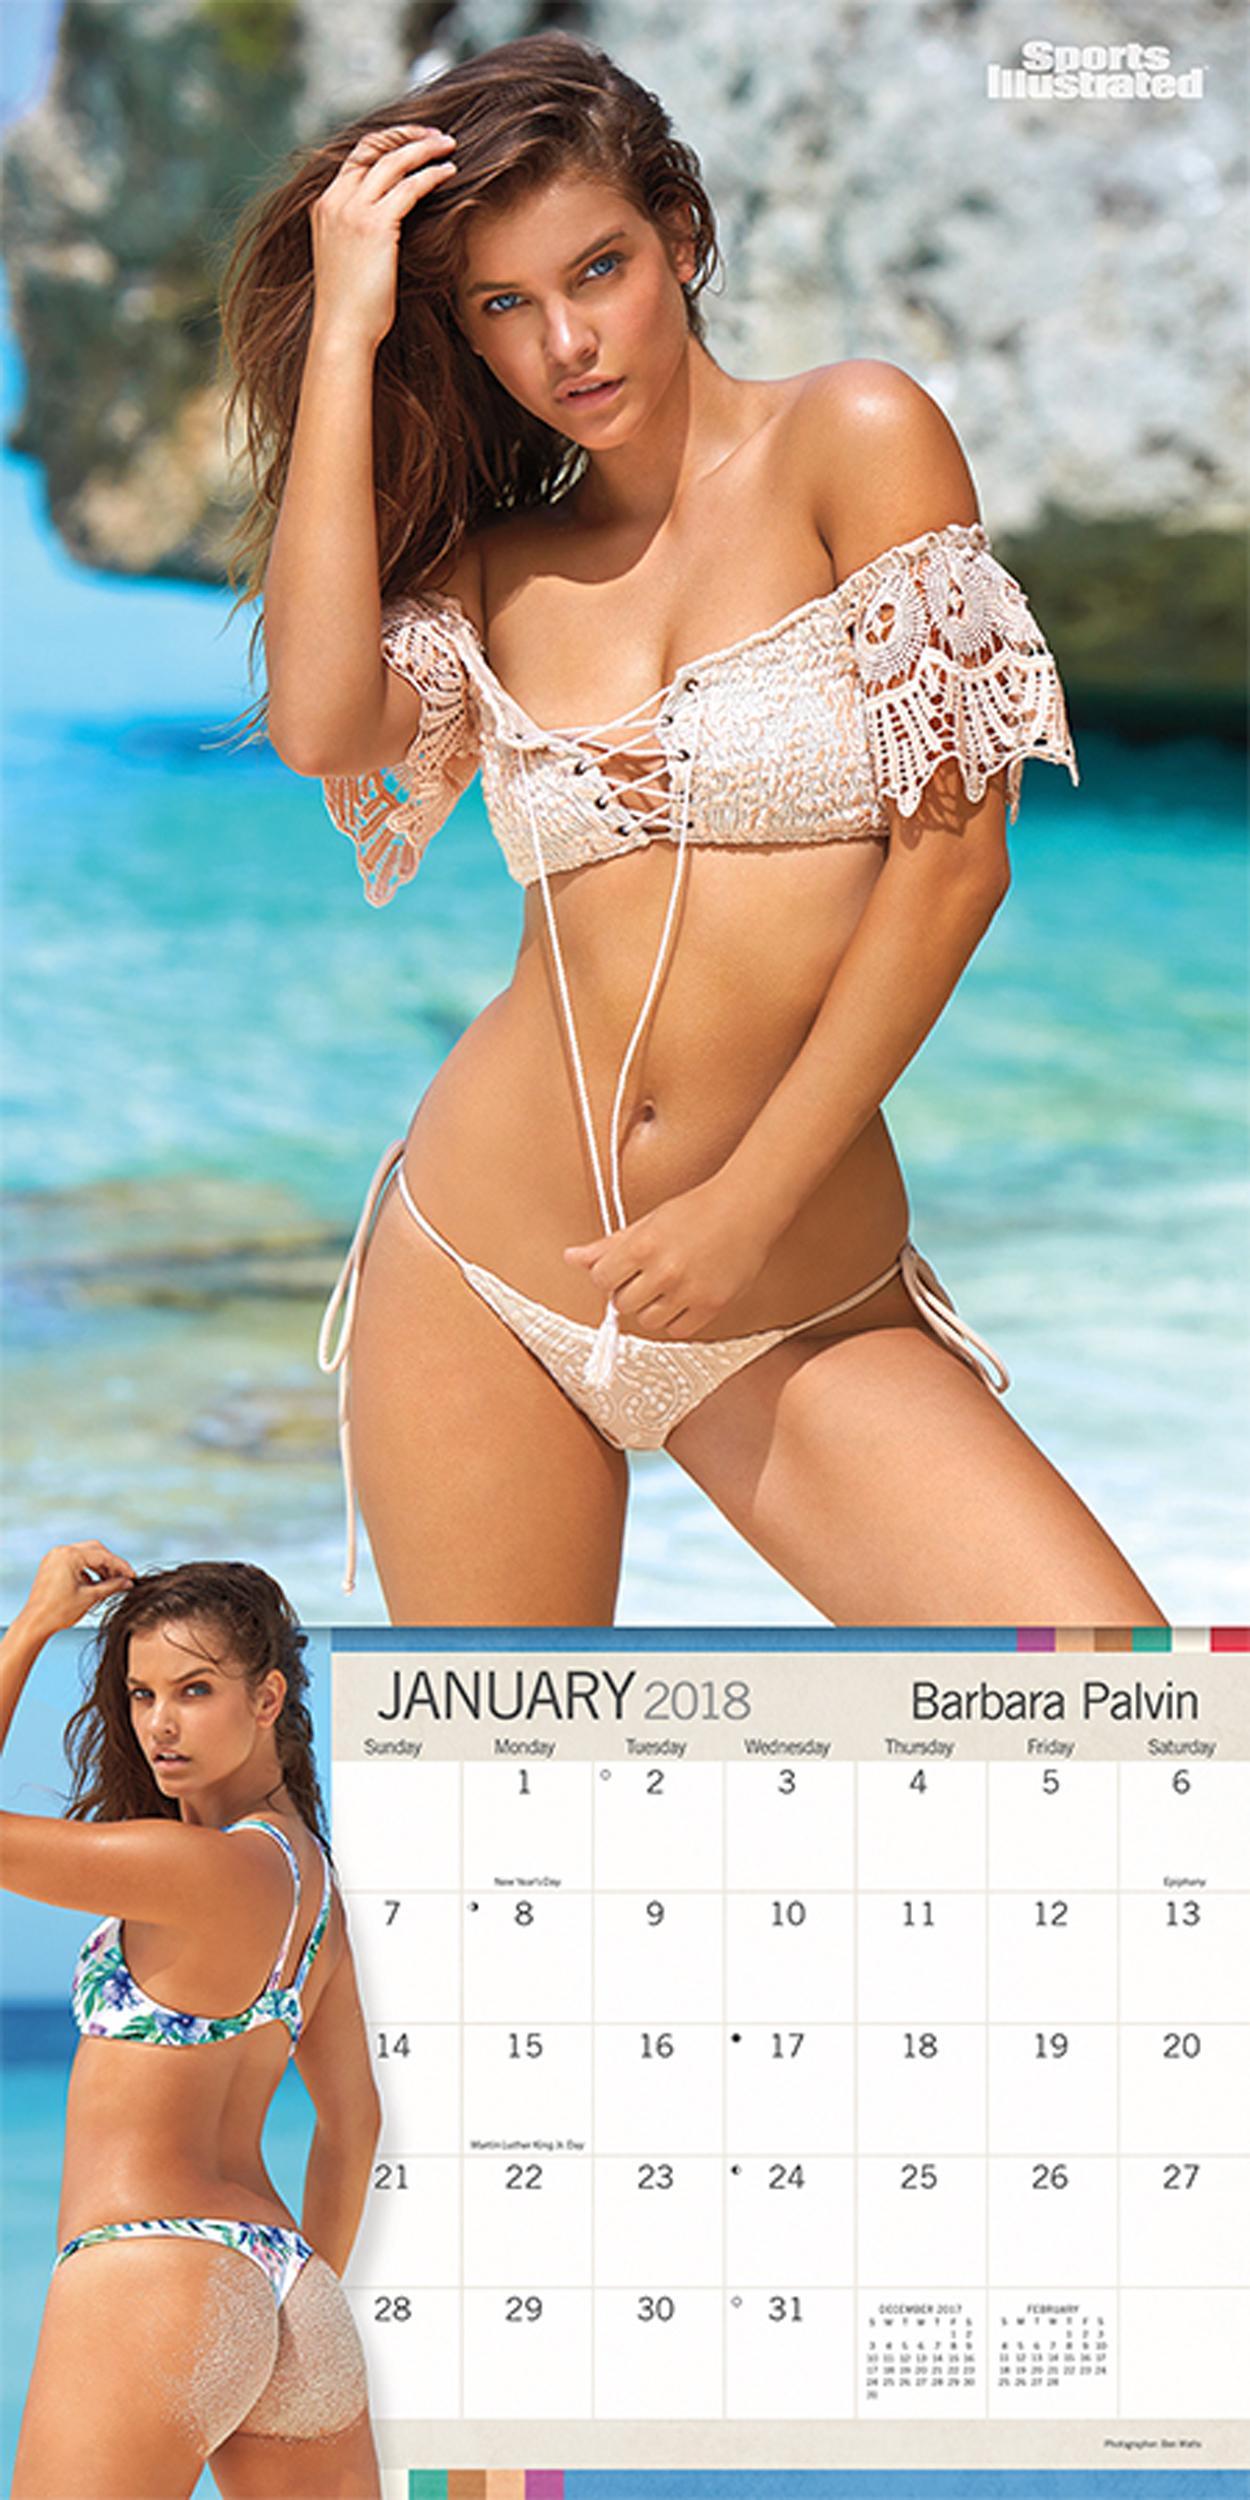 illustrated swimsuit sports calendar amazon wall trends october international dp january